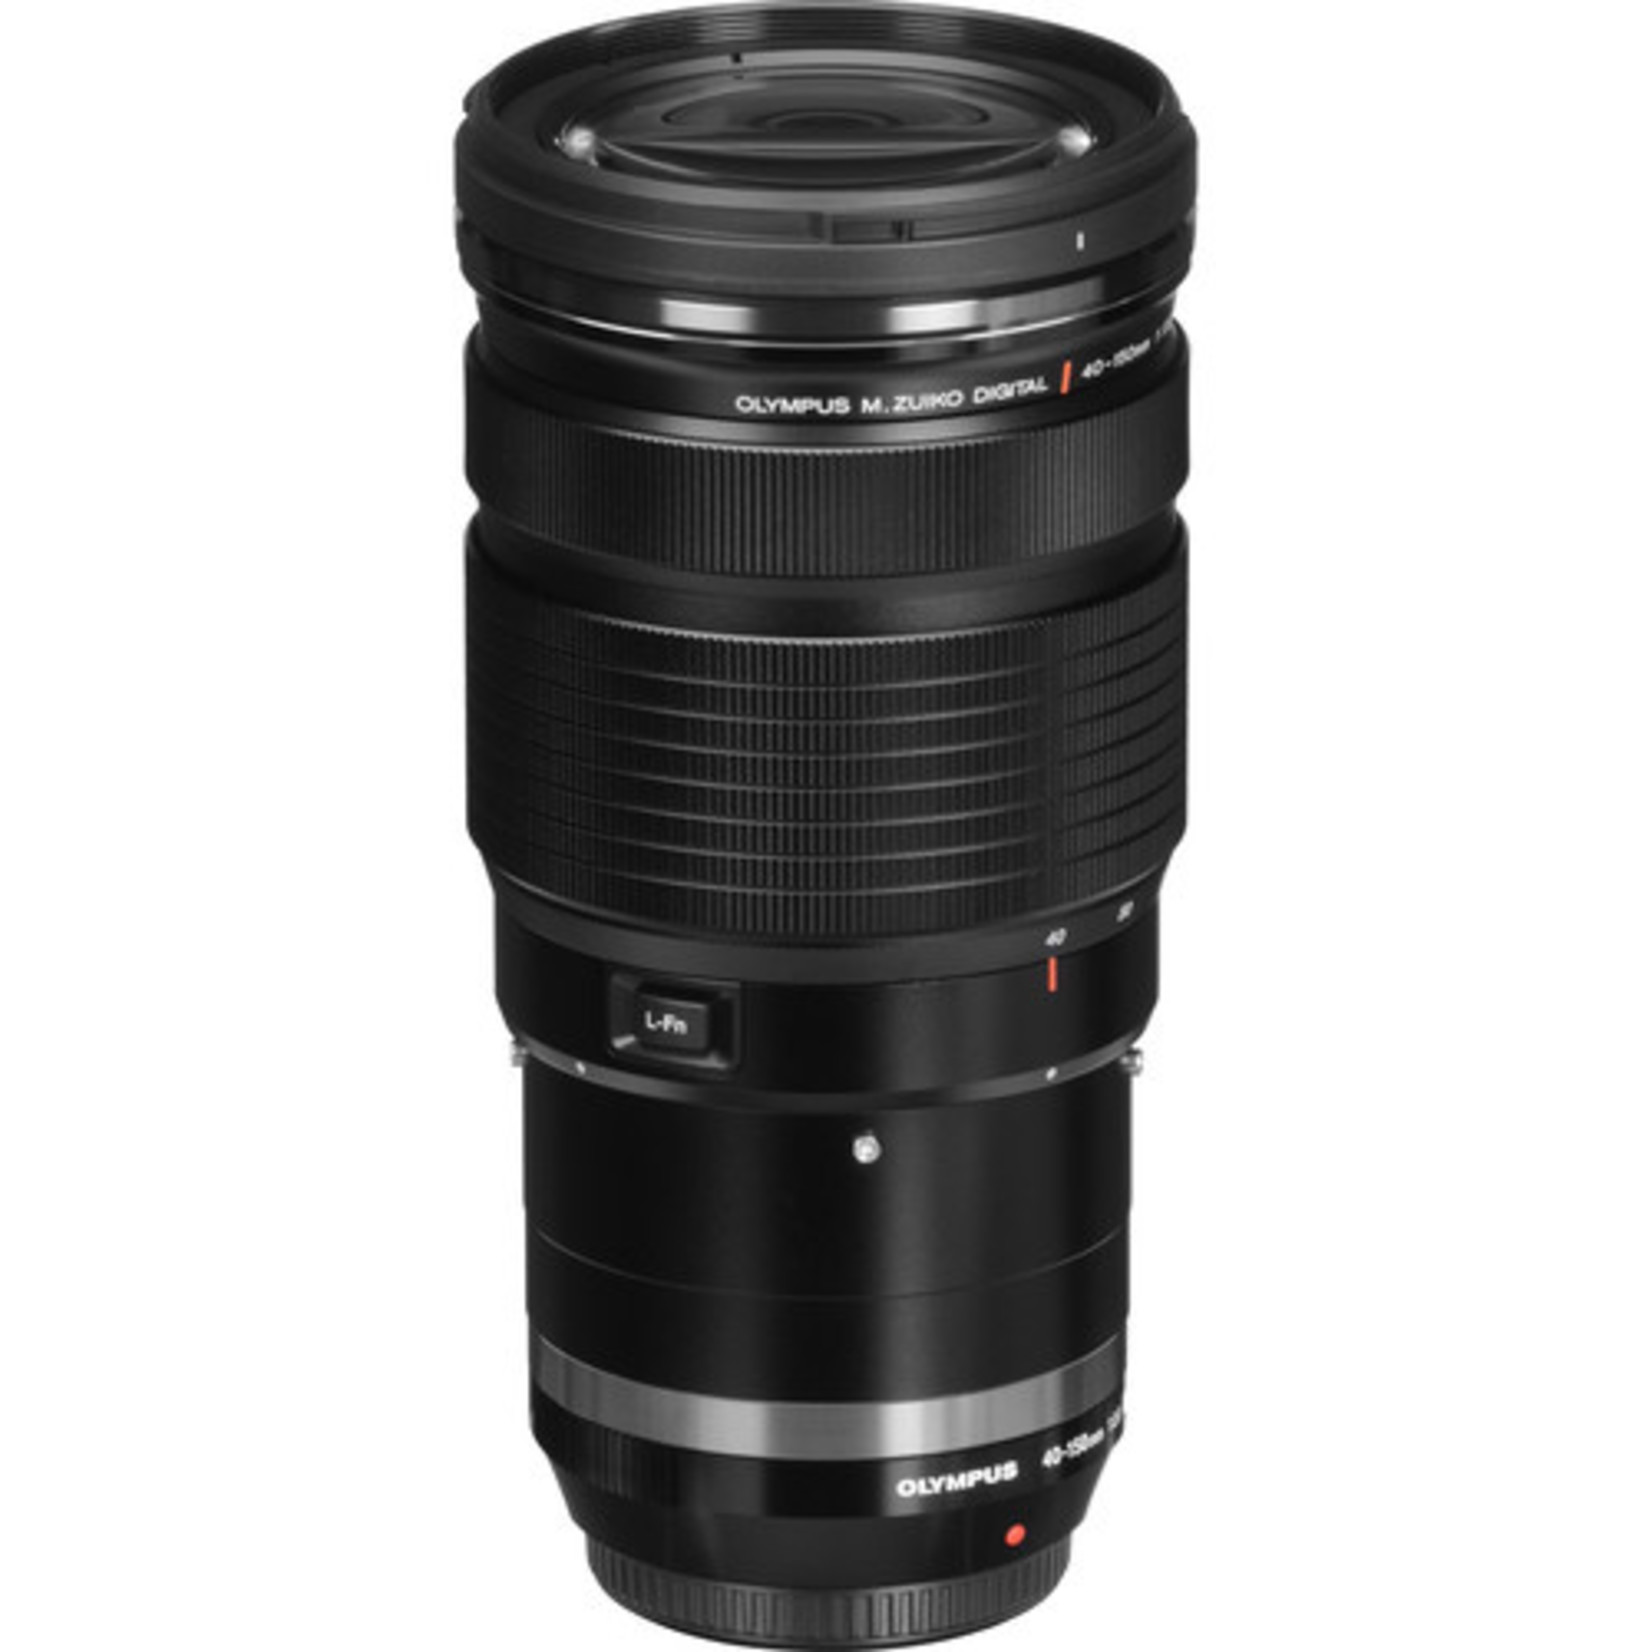 Olympus Olympus M.Zuiko Digital ED 40-150mm f/2.8 PRO Lens